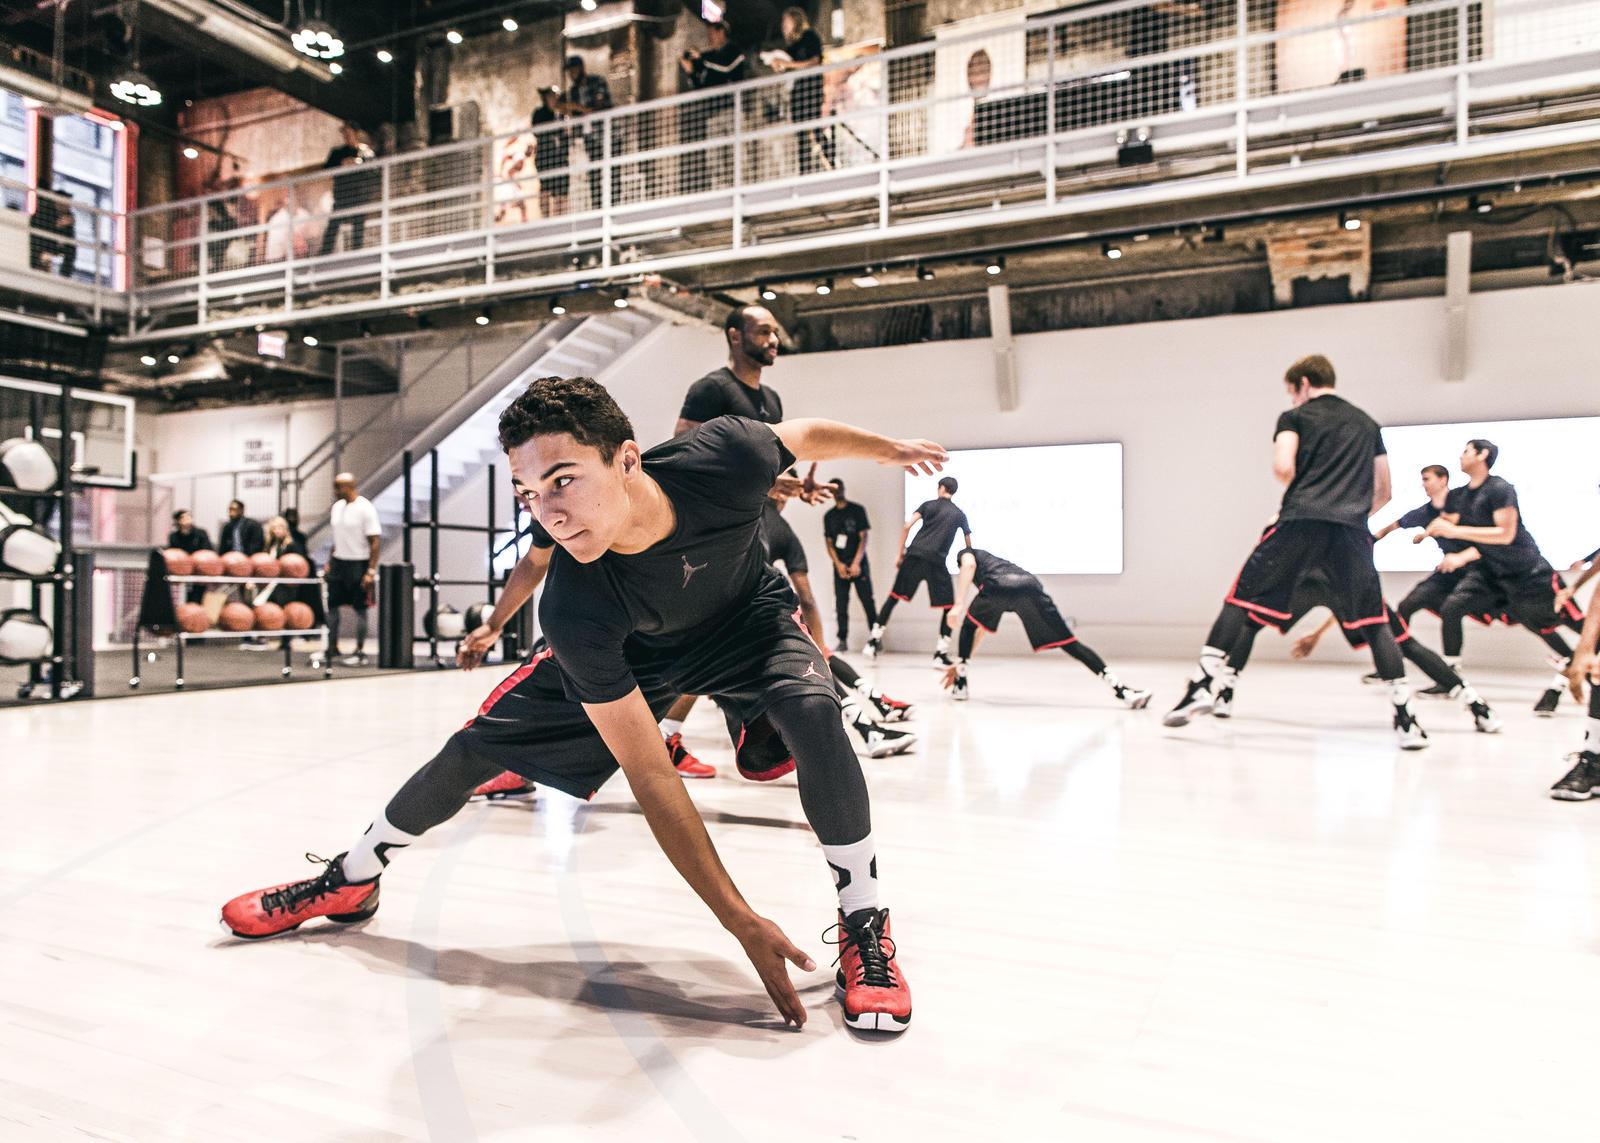 Jordan Training session at Station 23